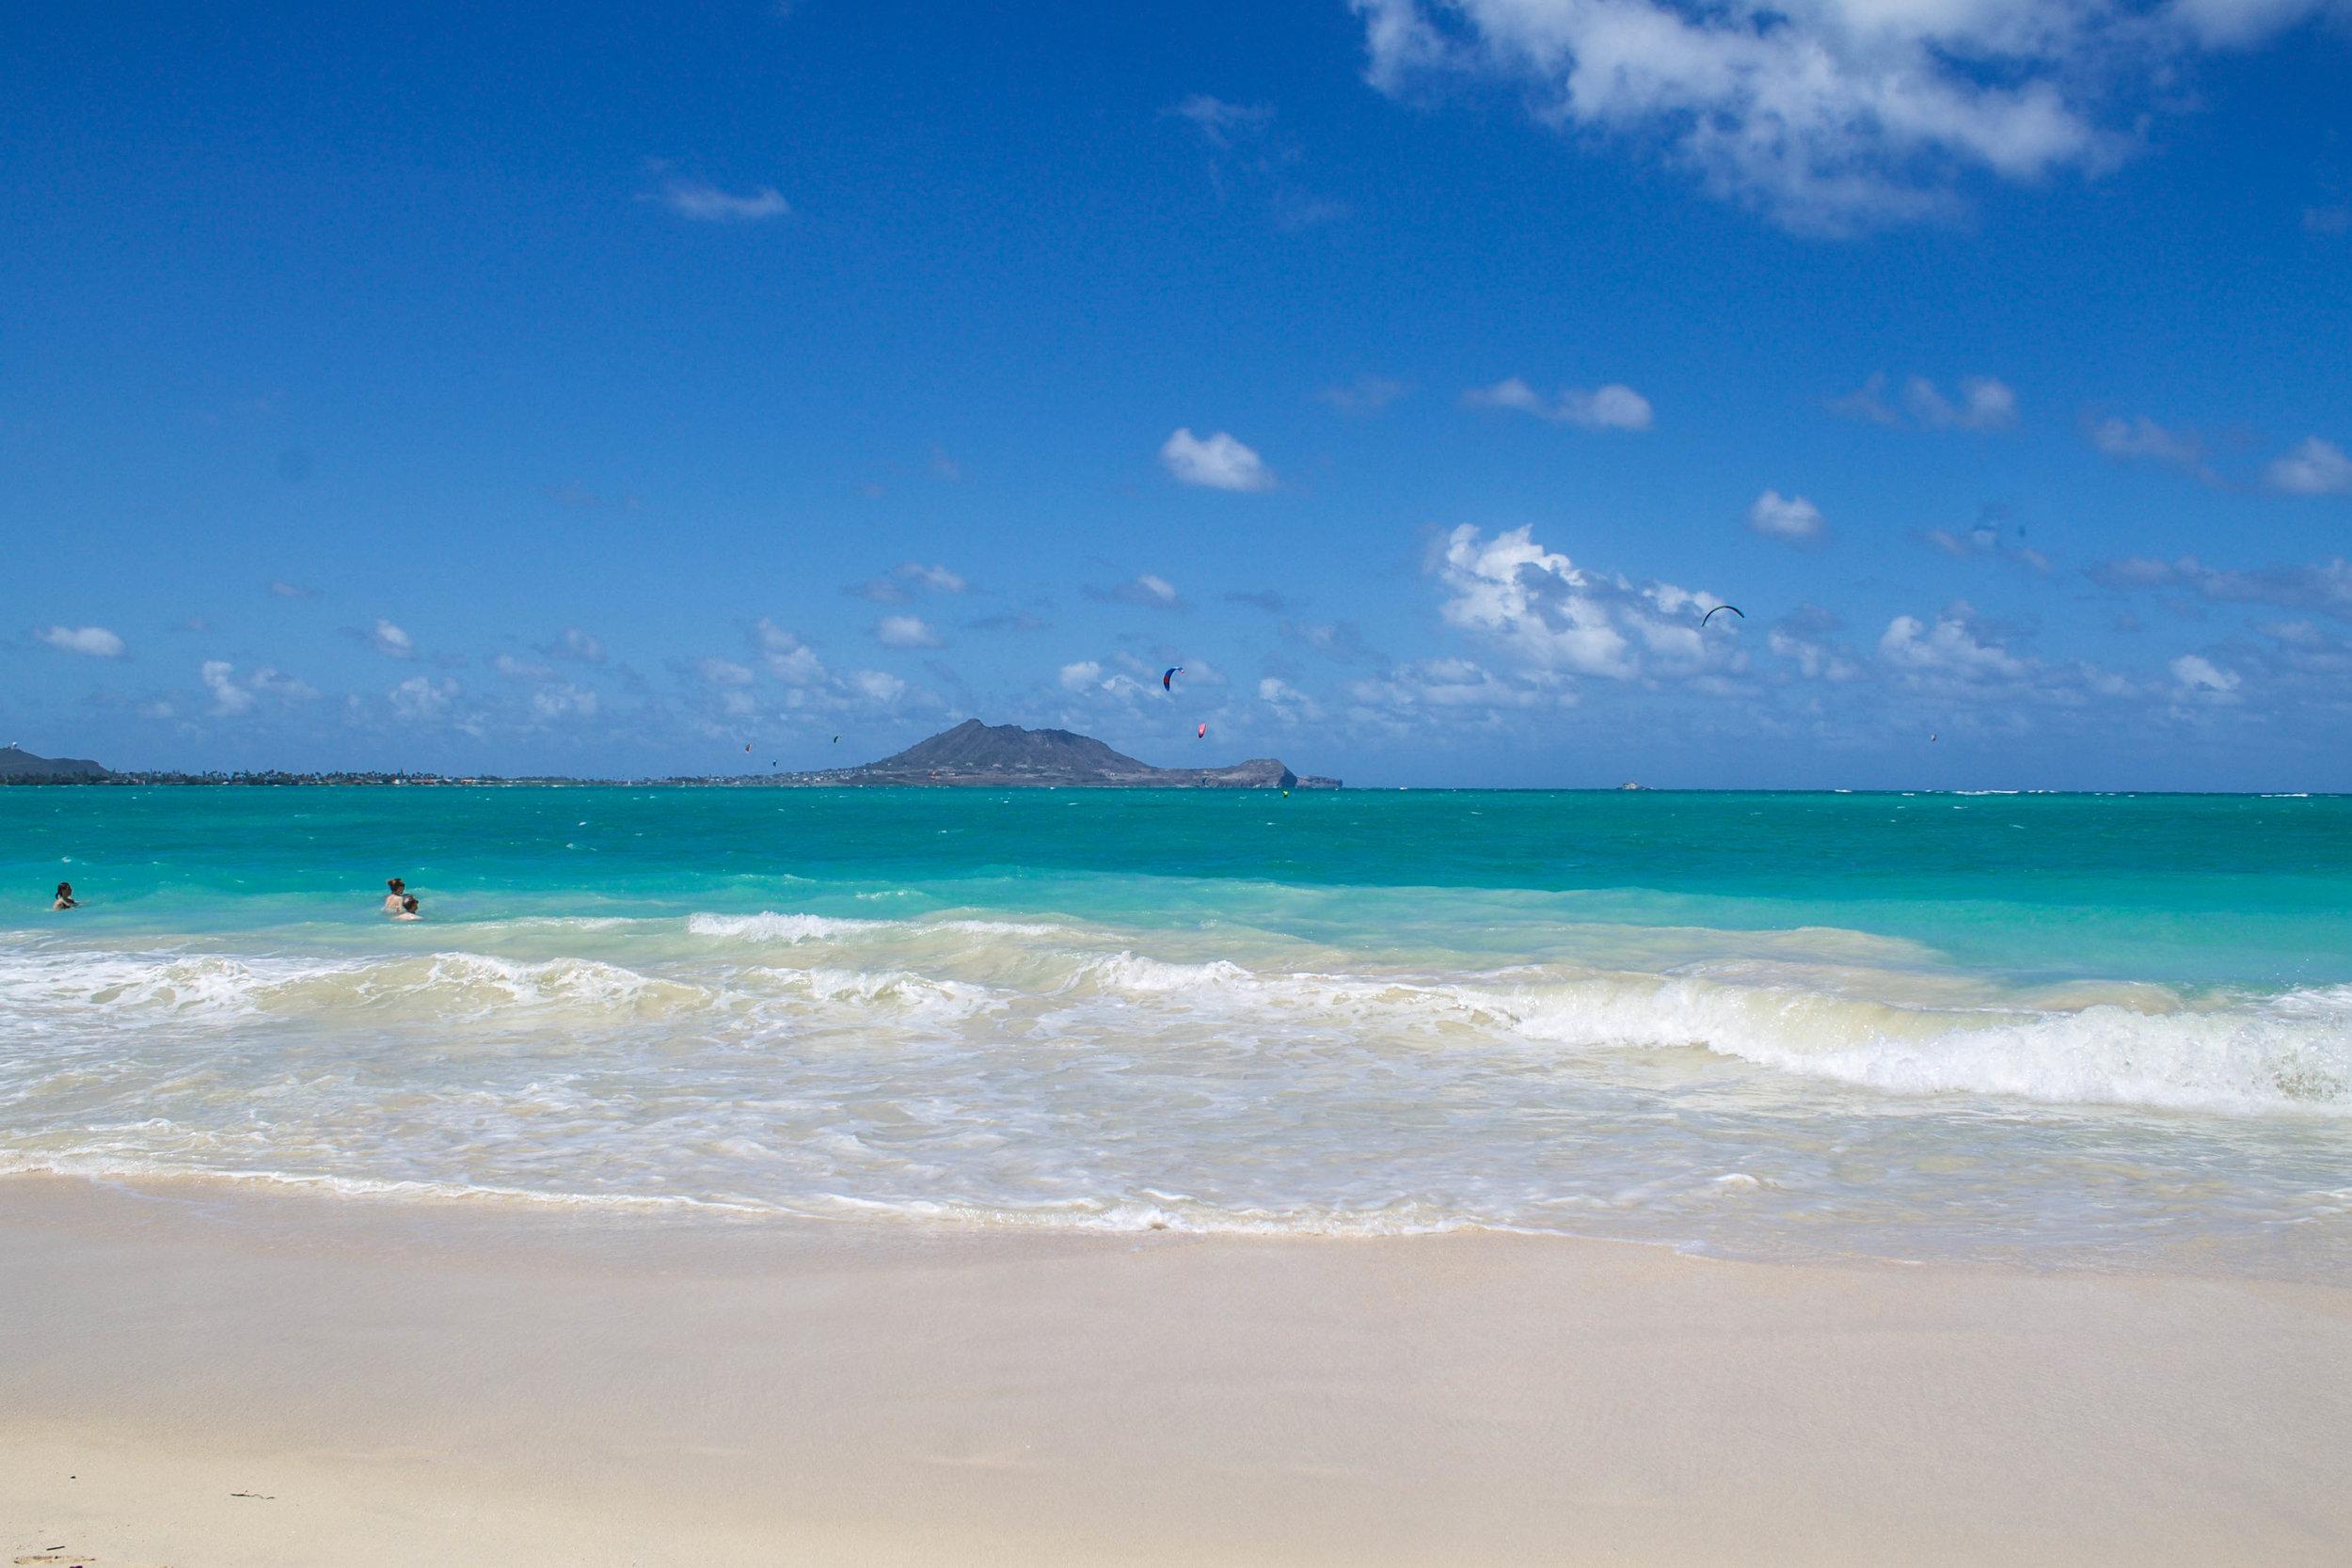 kailua-hawaii.jpg